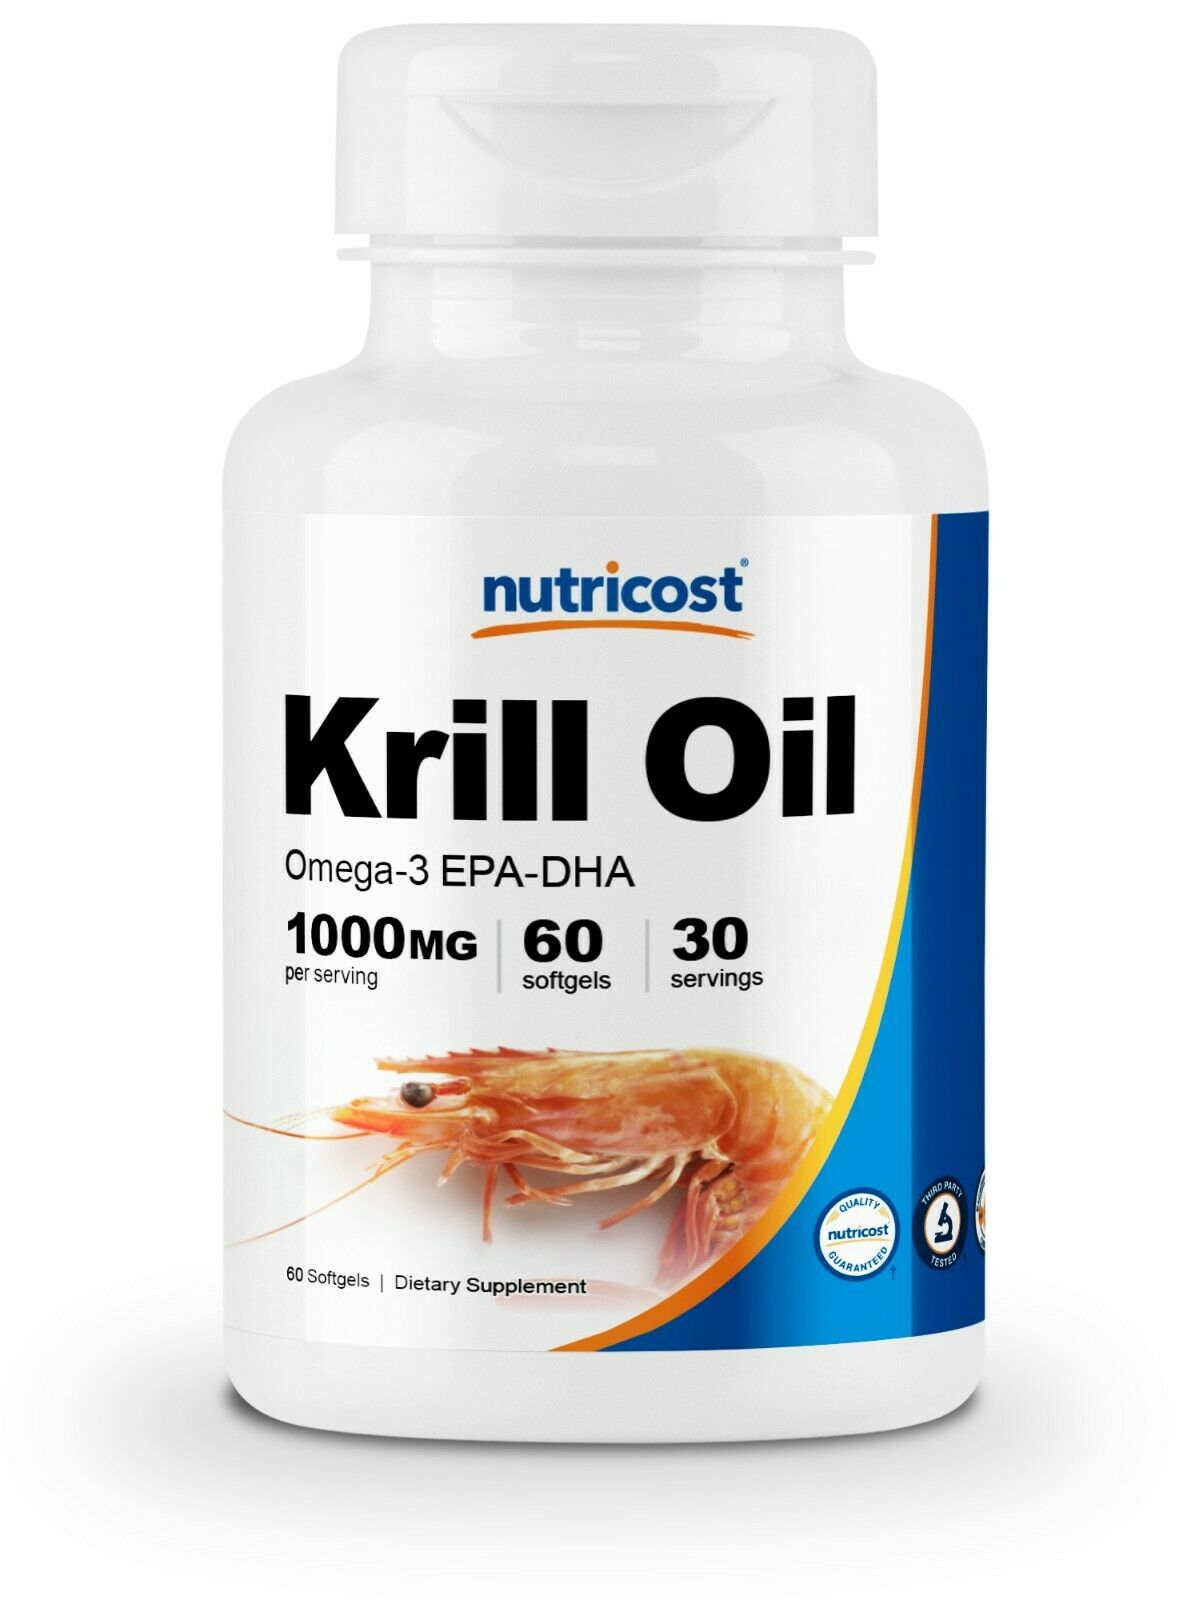 Nutricost Krill Oil 1000mg 60 Softgels